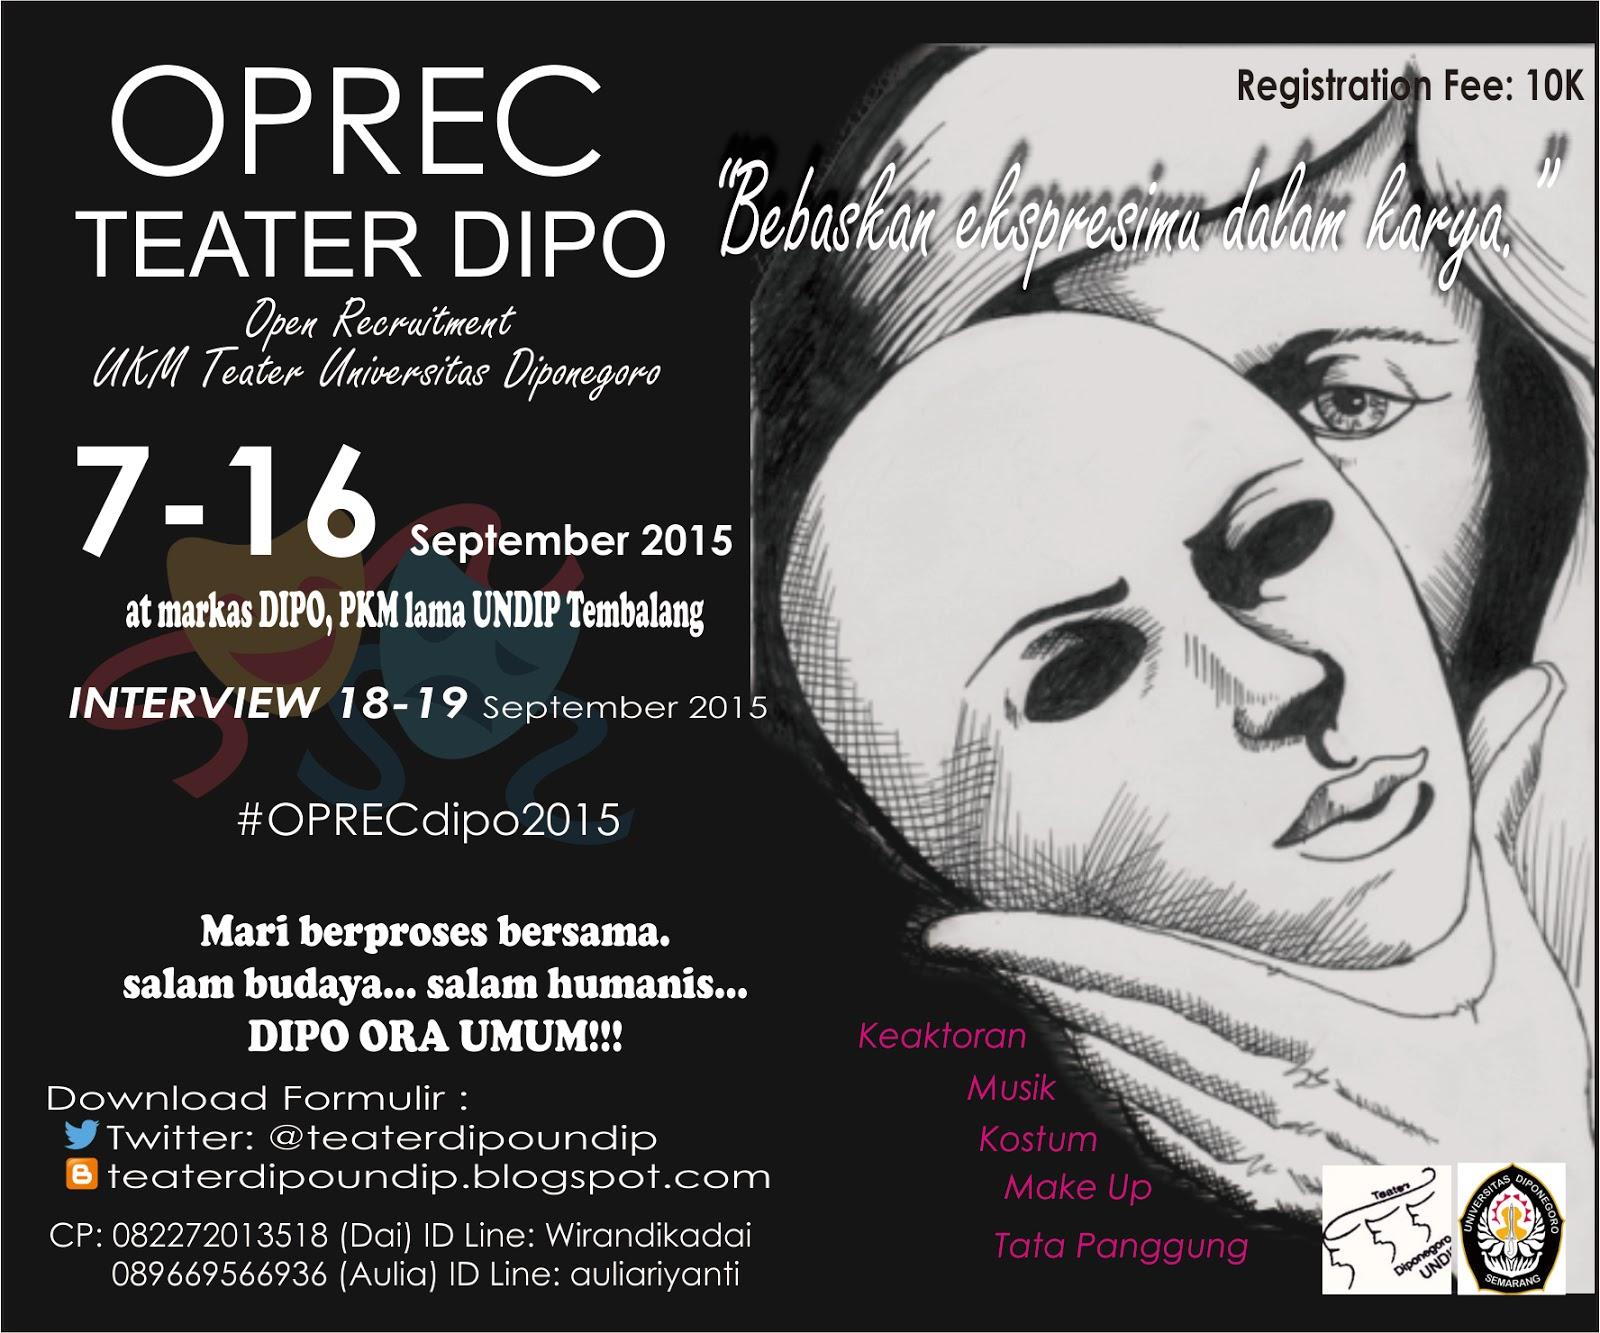 Open Recruitment Ukm Teater Diponegoro Oprec Dipo 2015 Teater